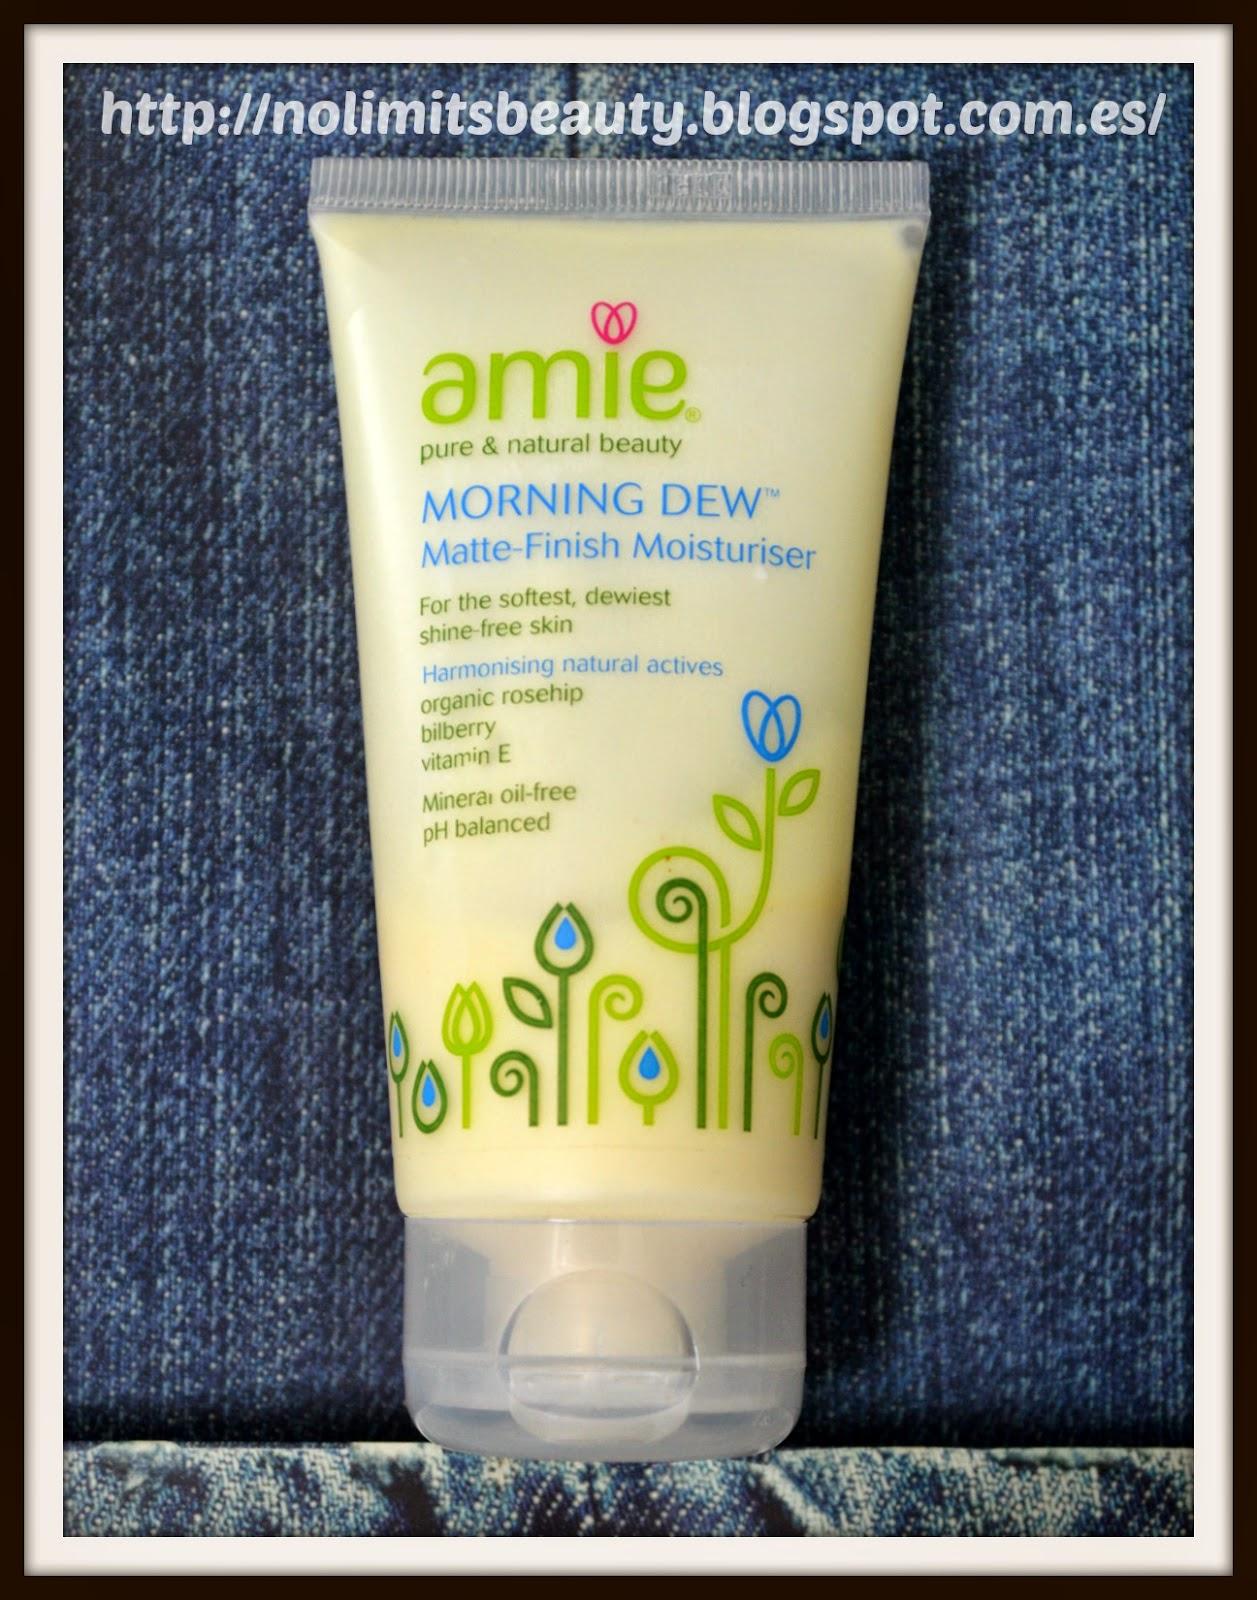 Amie Morning Dew - Matte Finish Moisturiser (review)